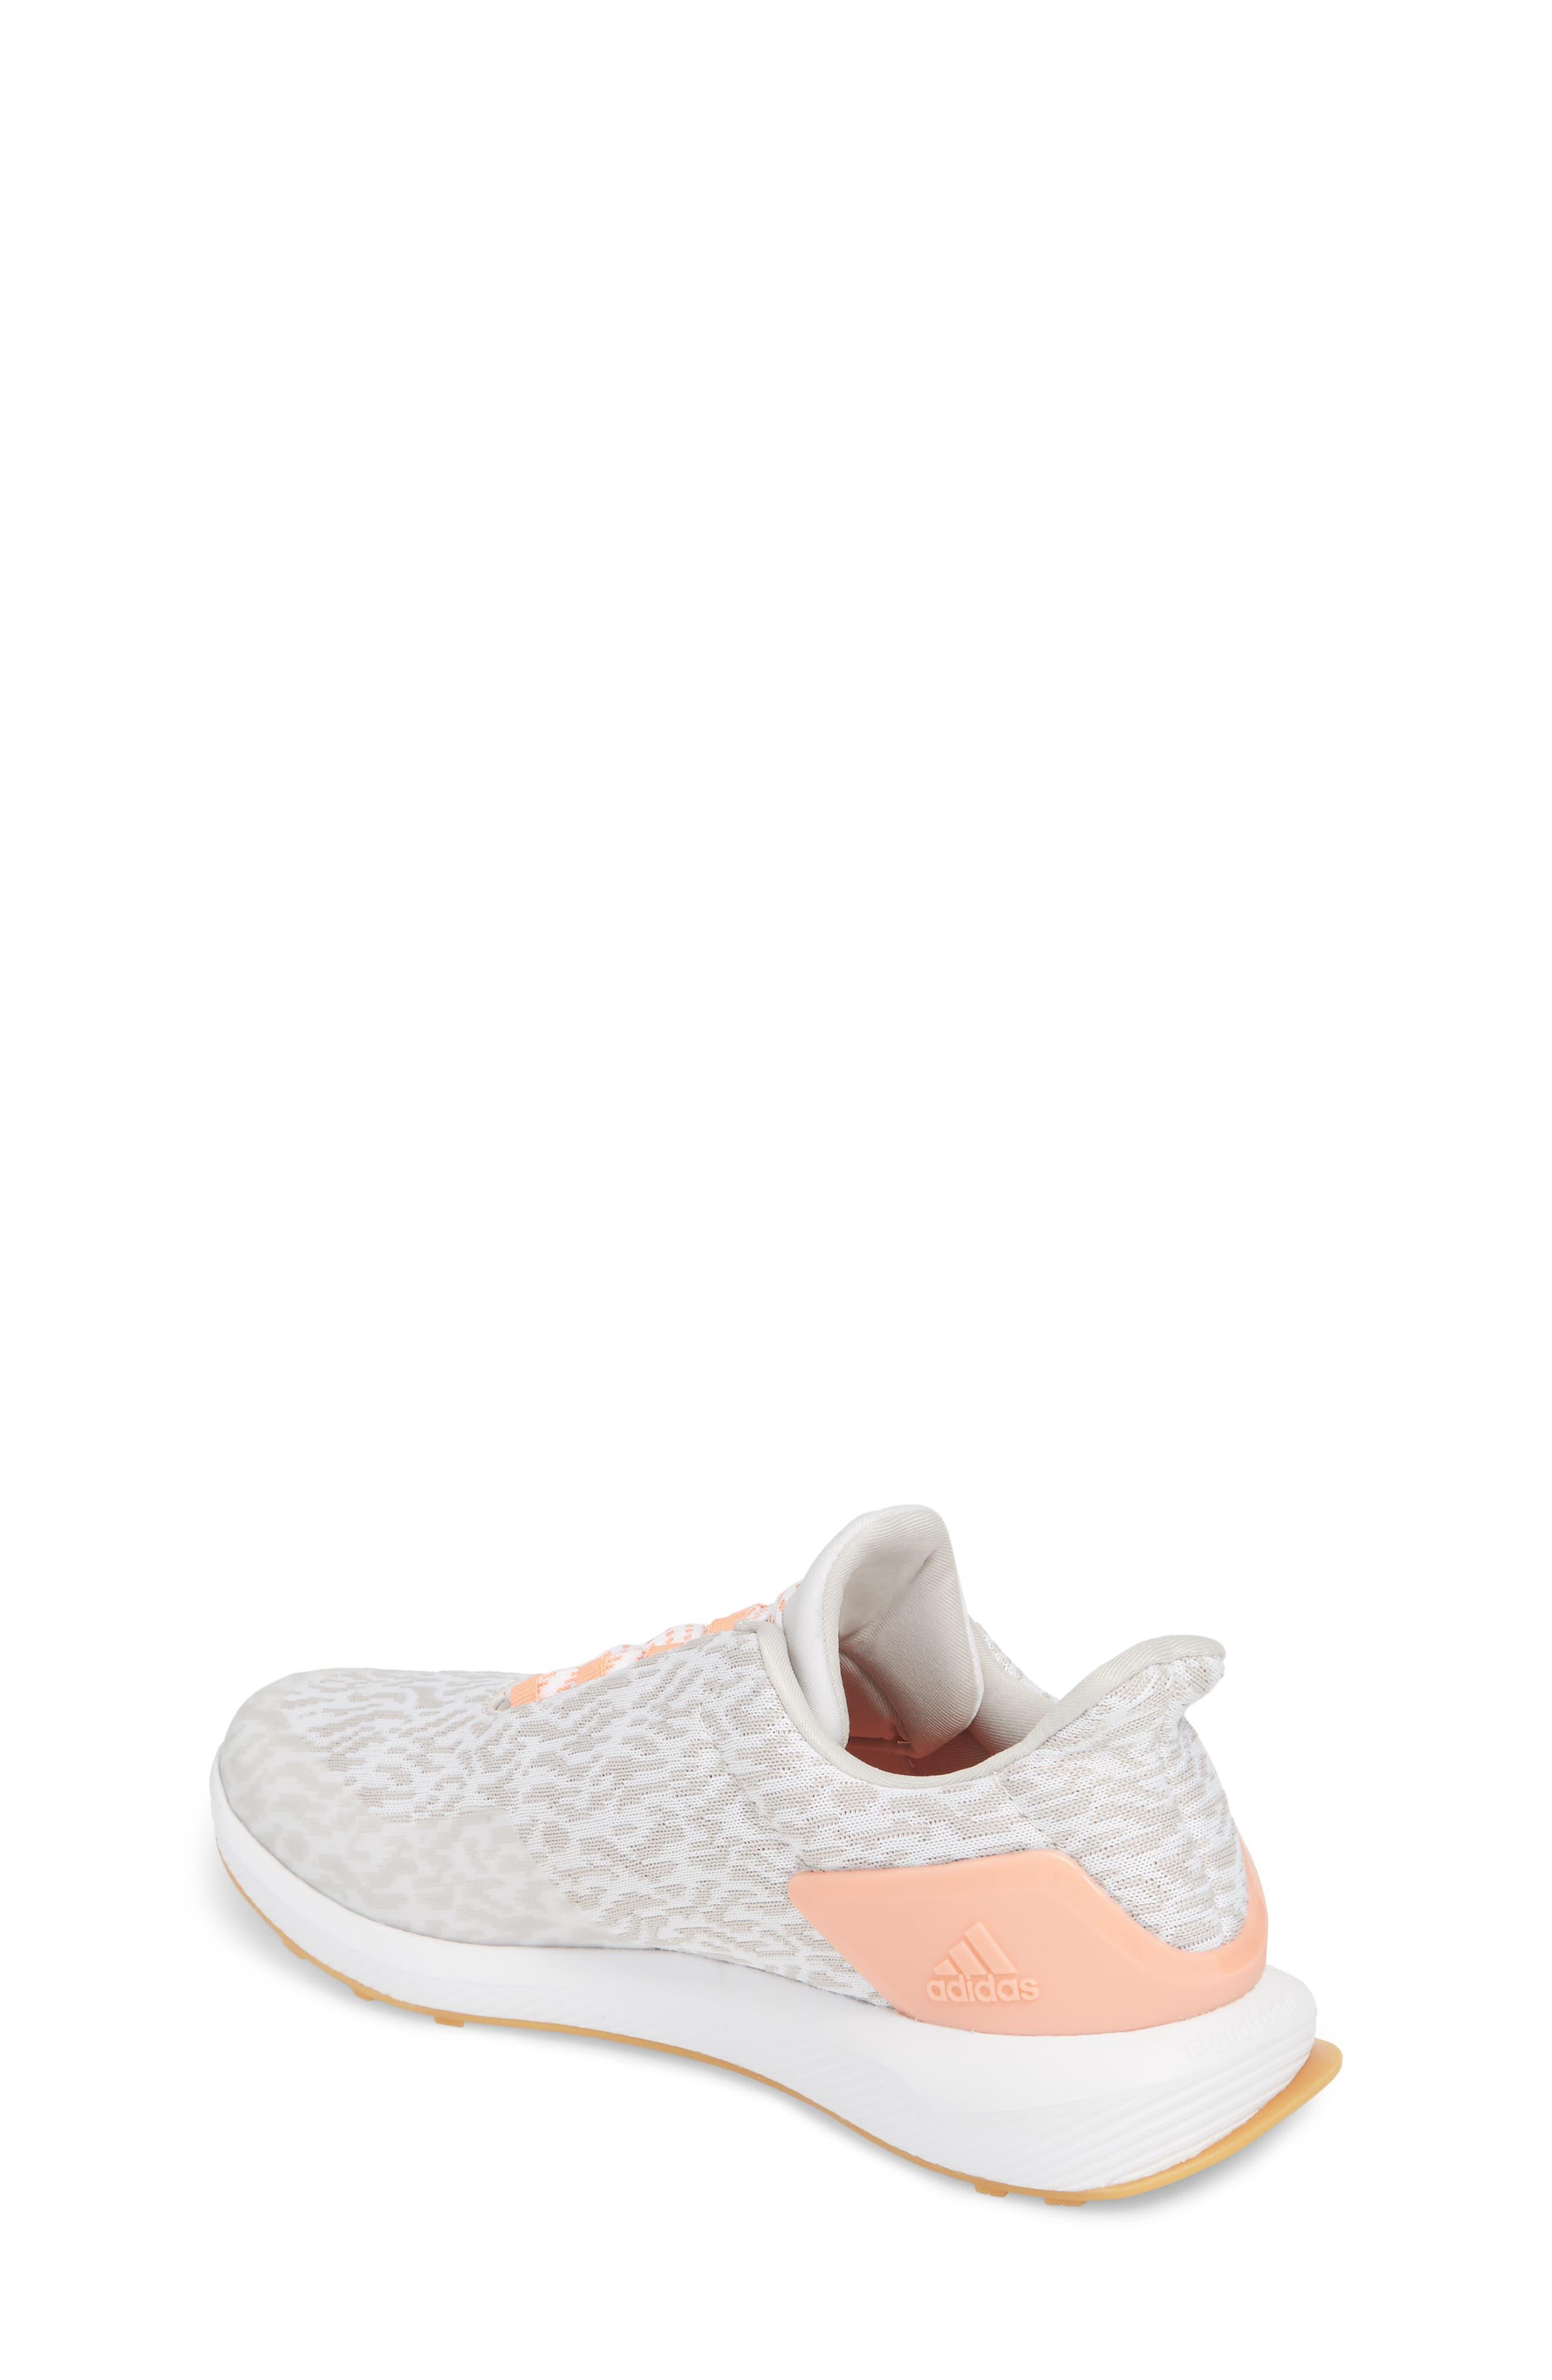 RapidaRun Uncaged Sneaker,                             Alternate thumbnail 2, color,                             White / Pearl/ Coral